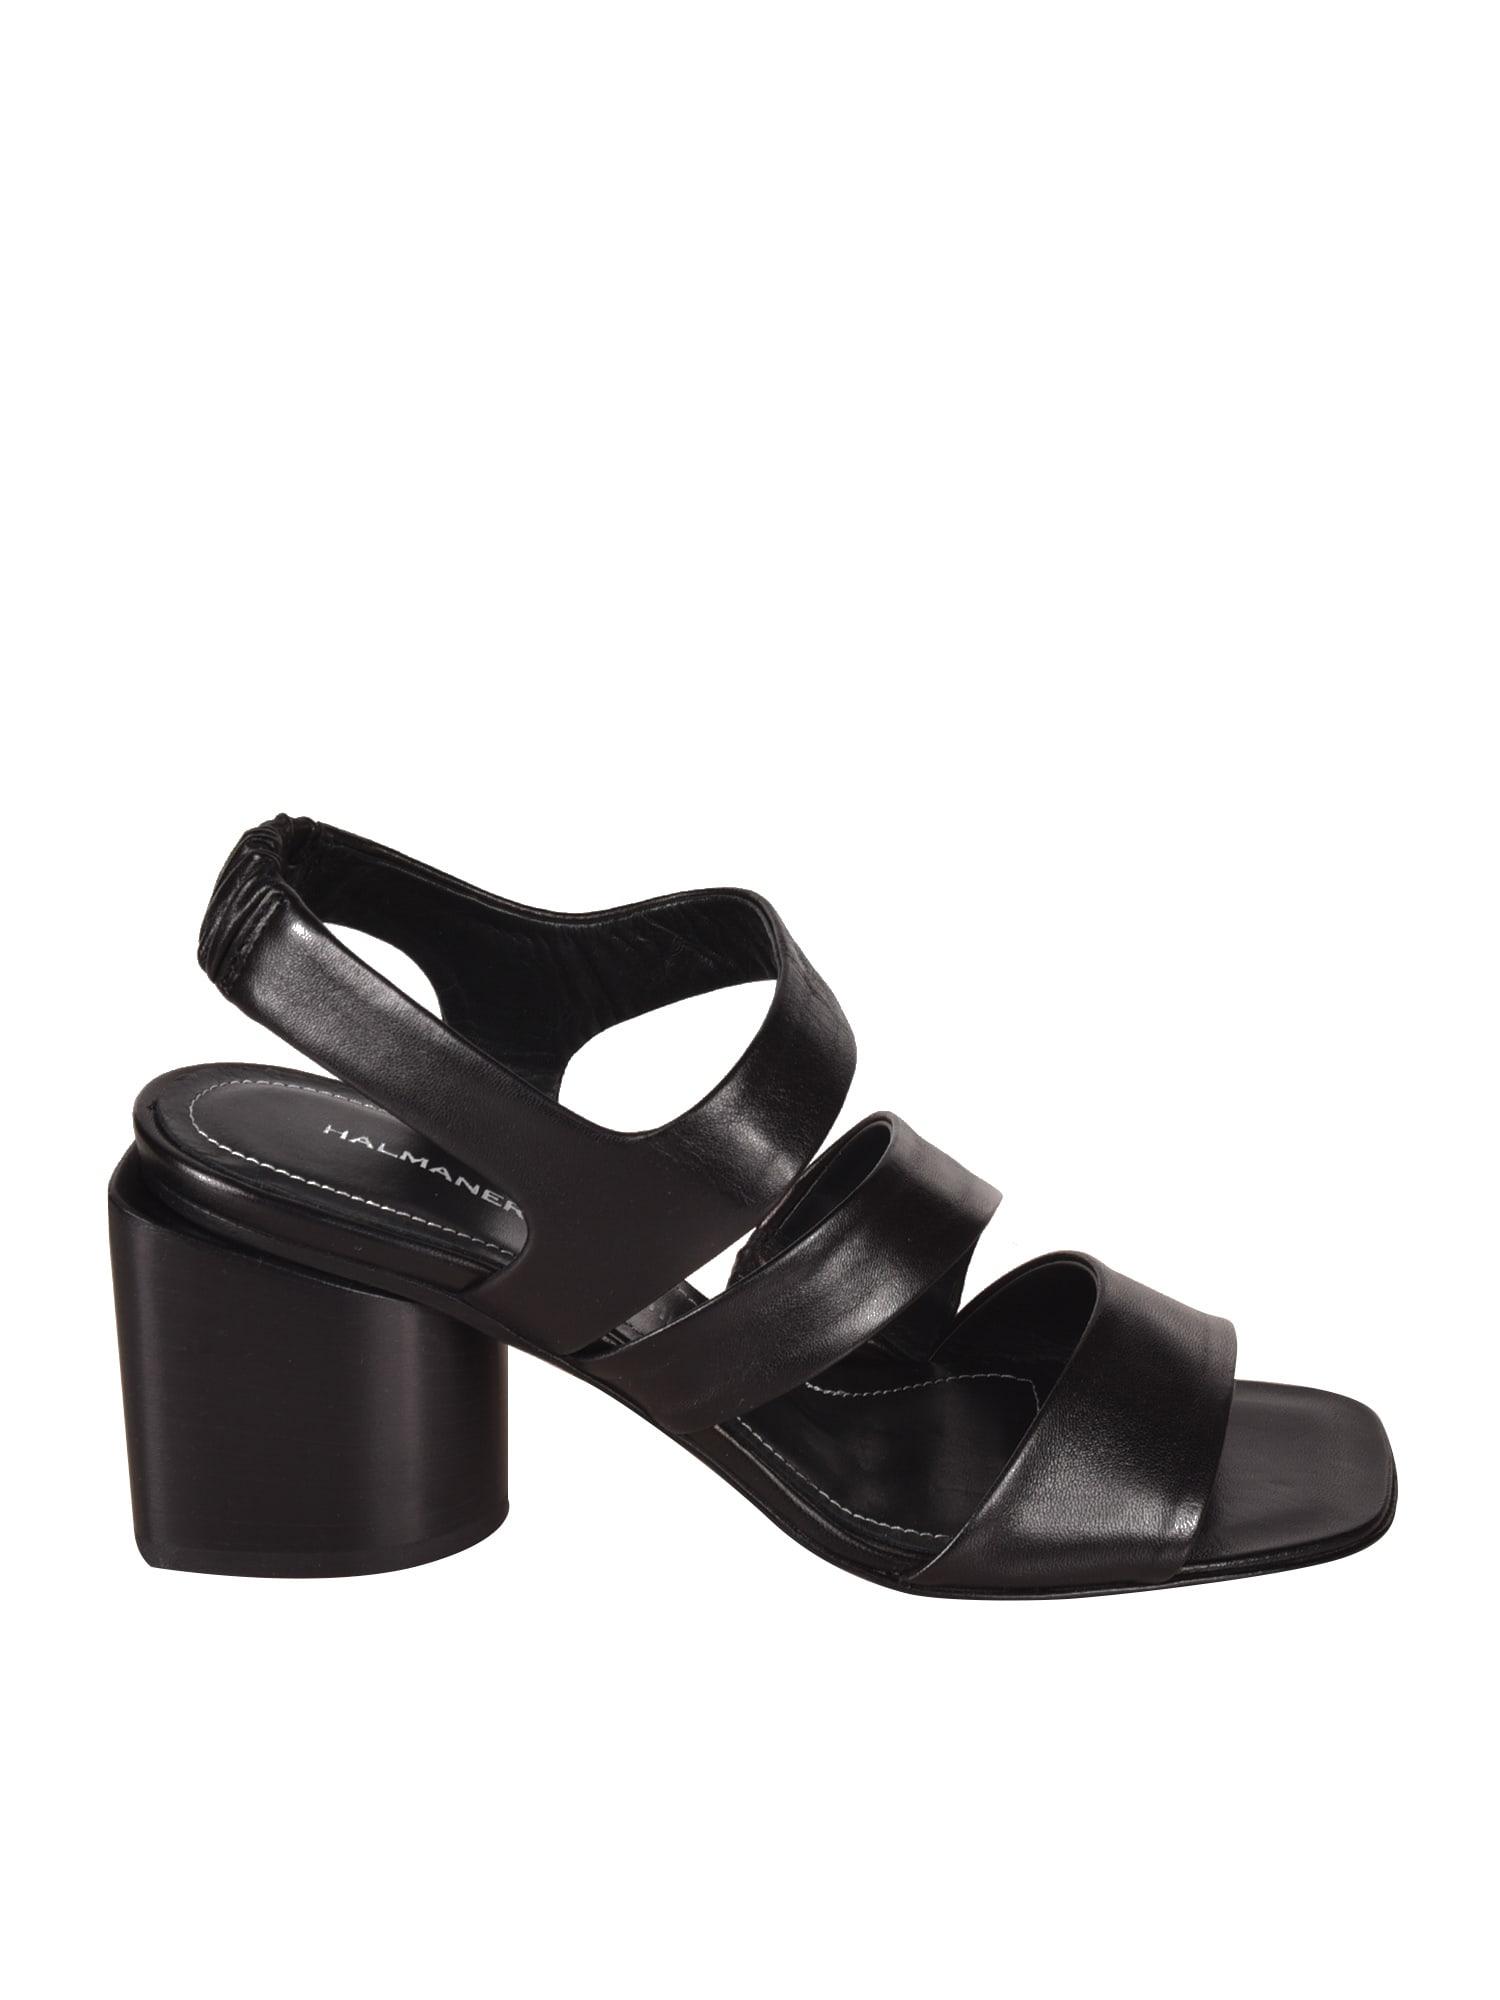 Doris 25 Sandals